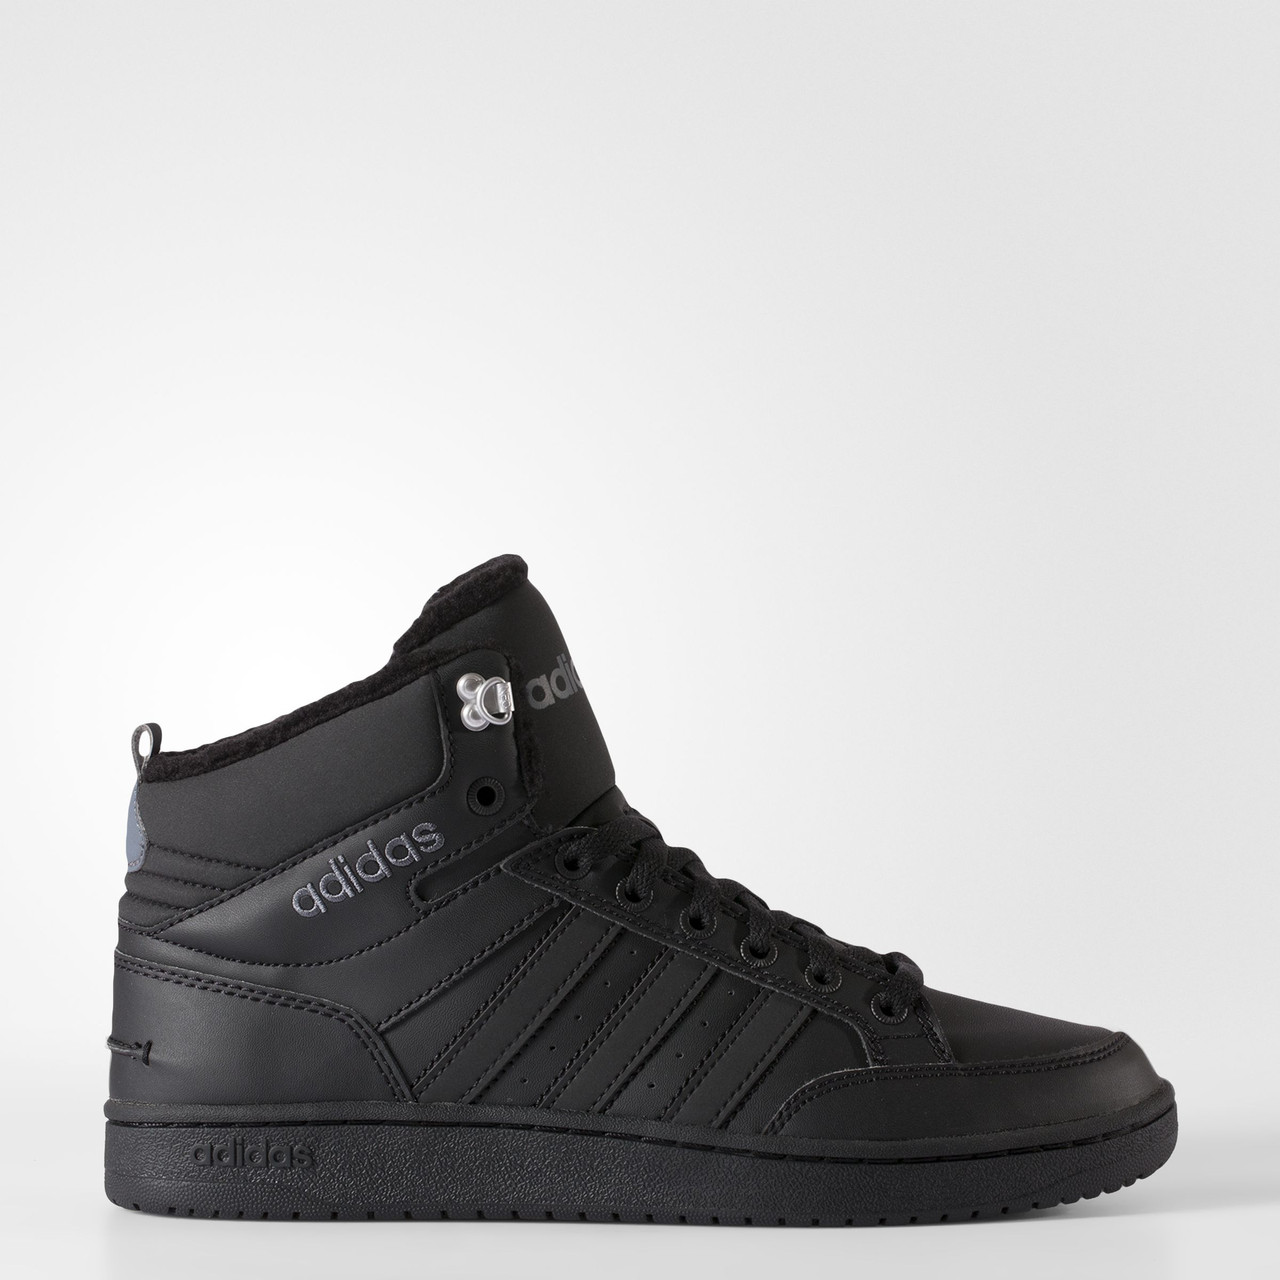 ??????? ??????? Adidas Neo Hoops Premium AW4274